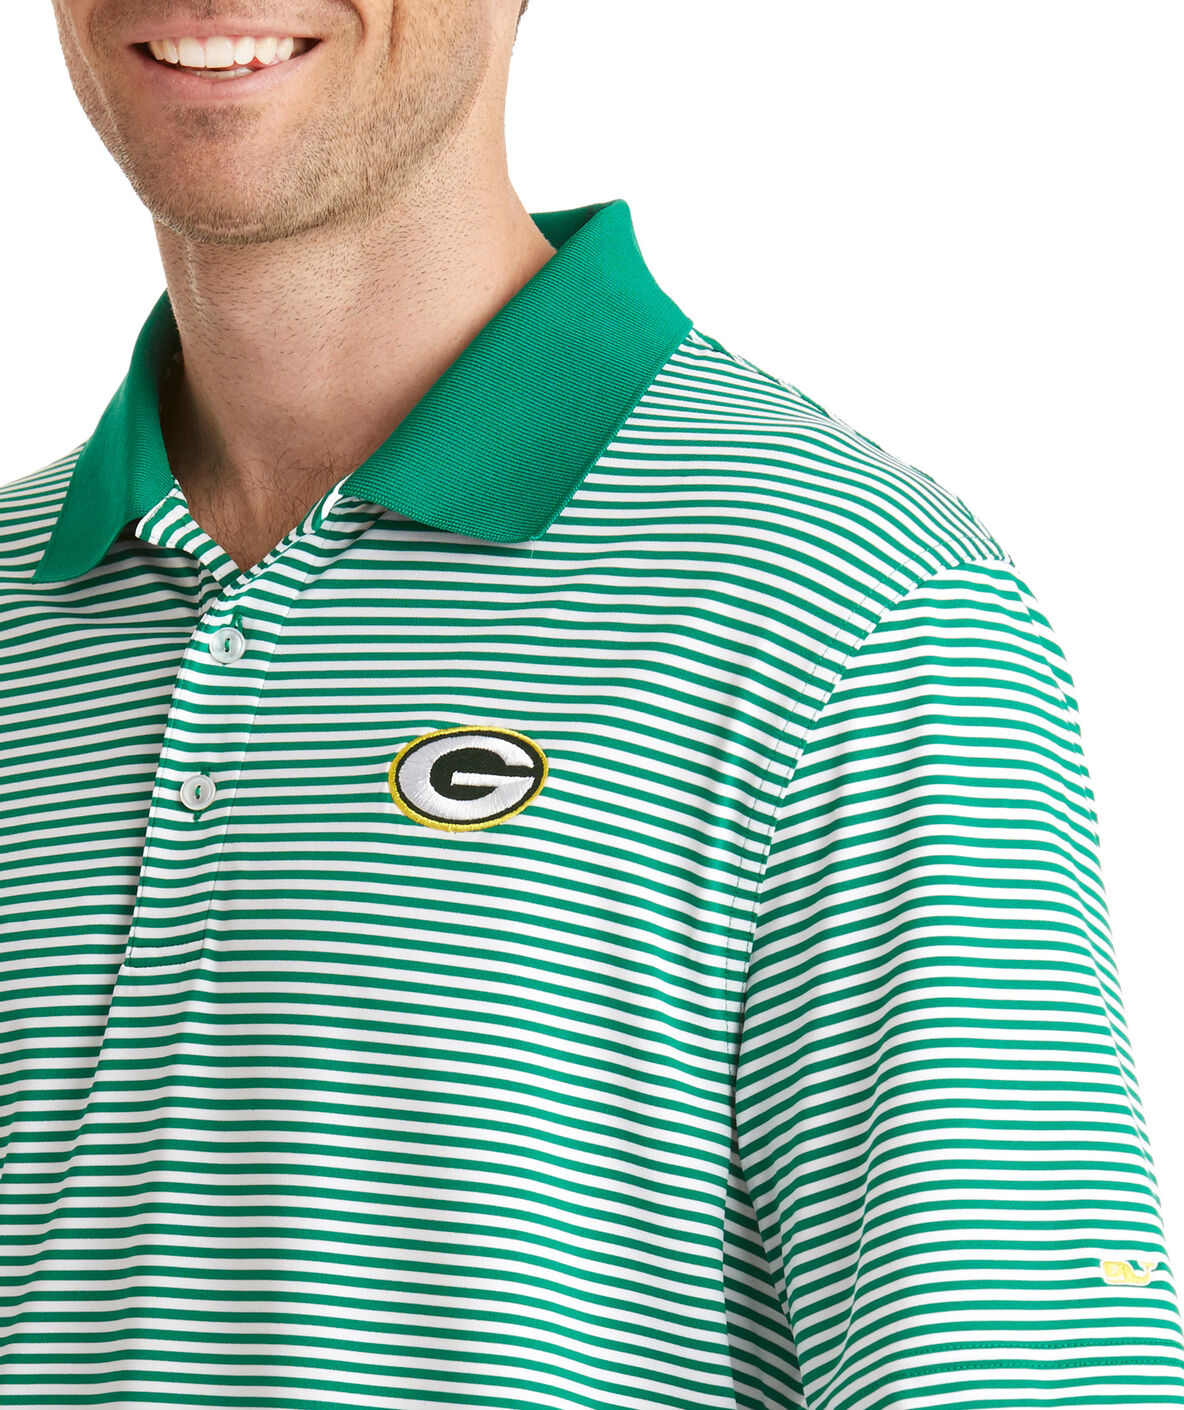 Shop Green Bay Packers Porter Stripe Polo At Vineyard Vines